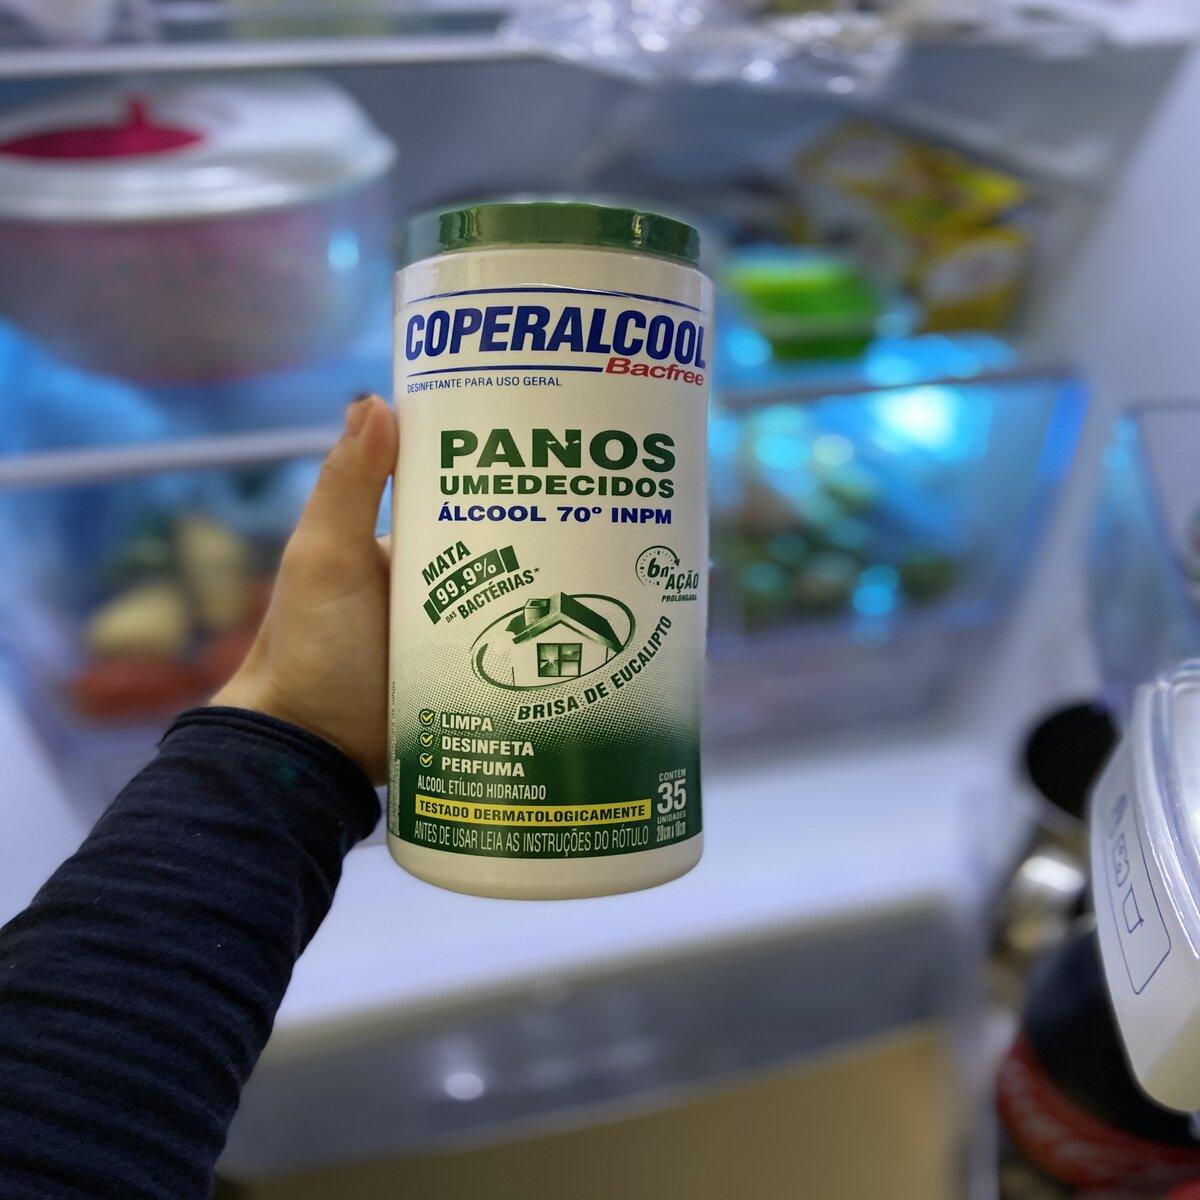 PANOS UMED POTE COPERALCOOL C/35 - EUCALIPTO